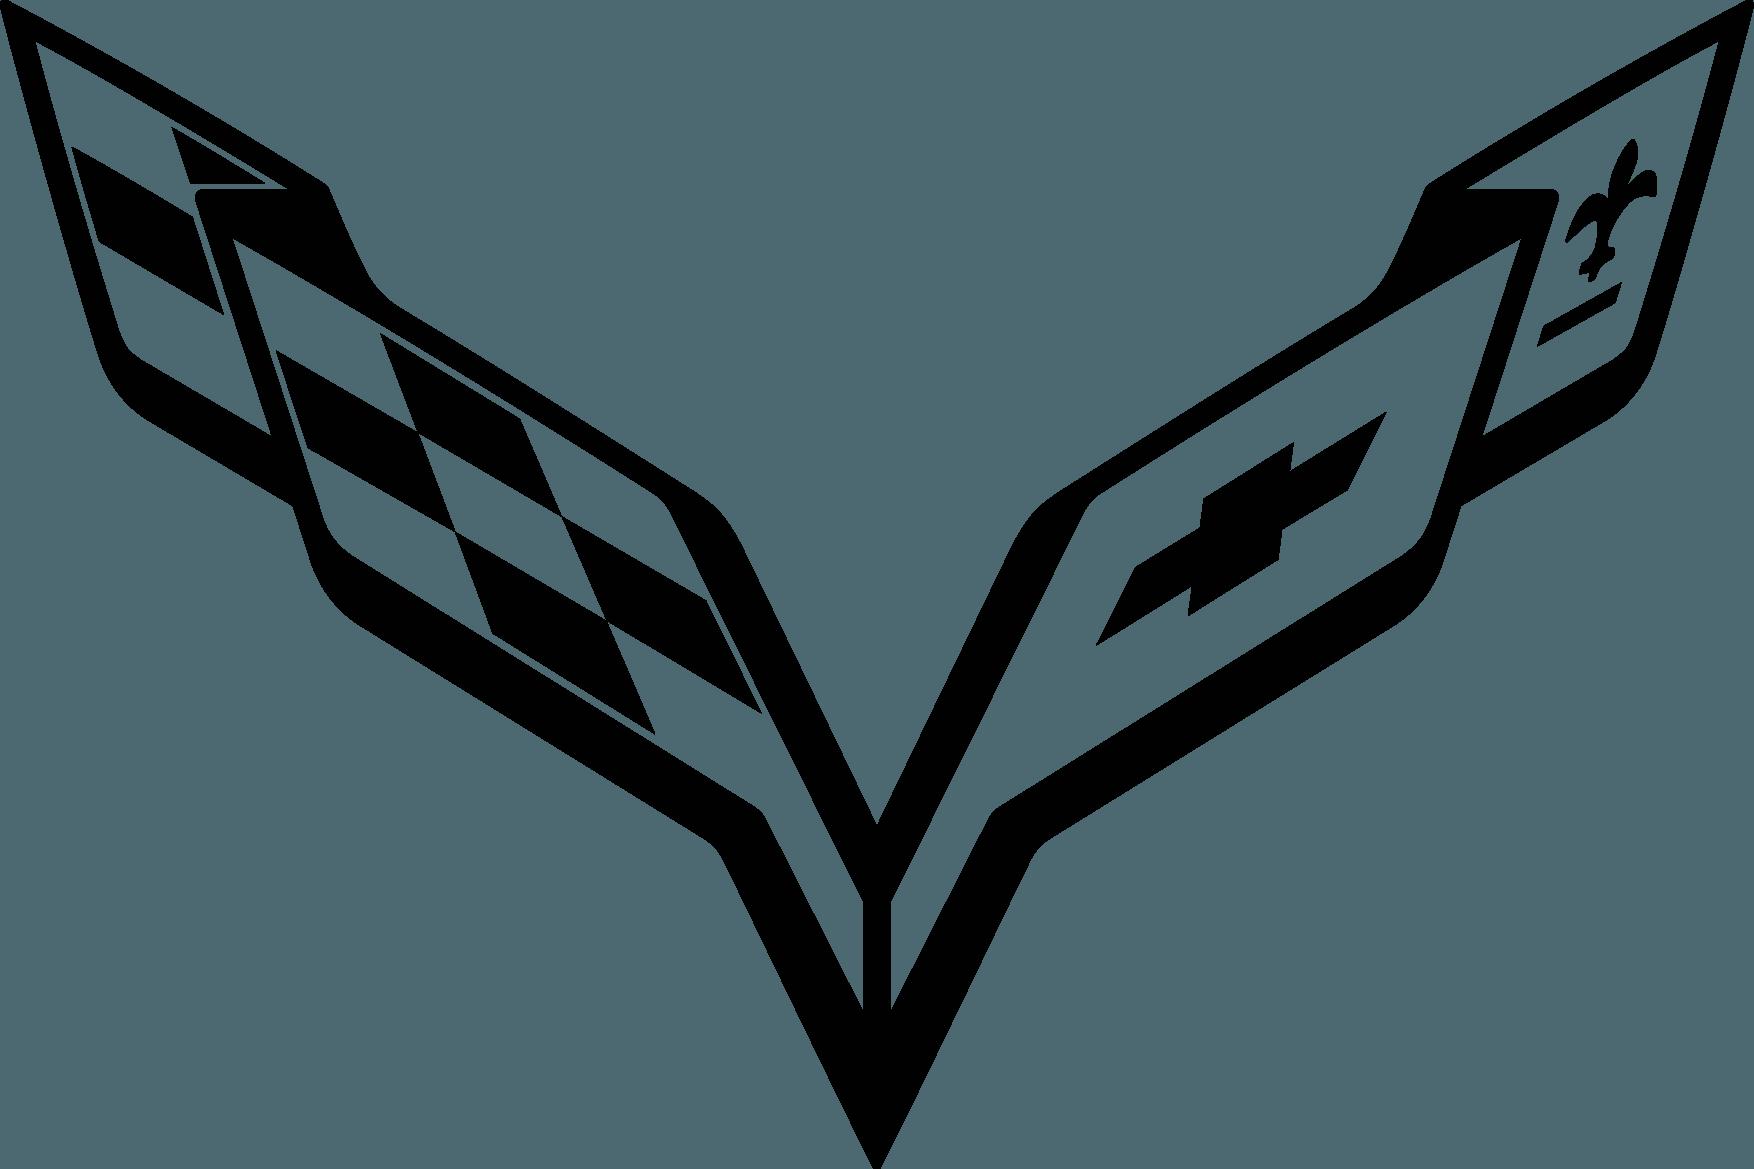 corvette logo chevrolet pdf free vector download freelogovectors